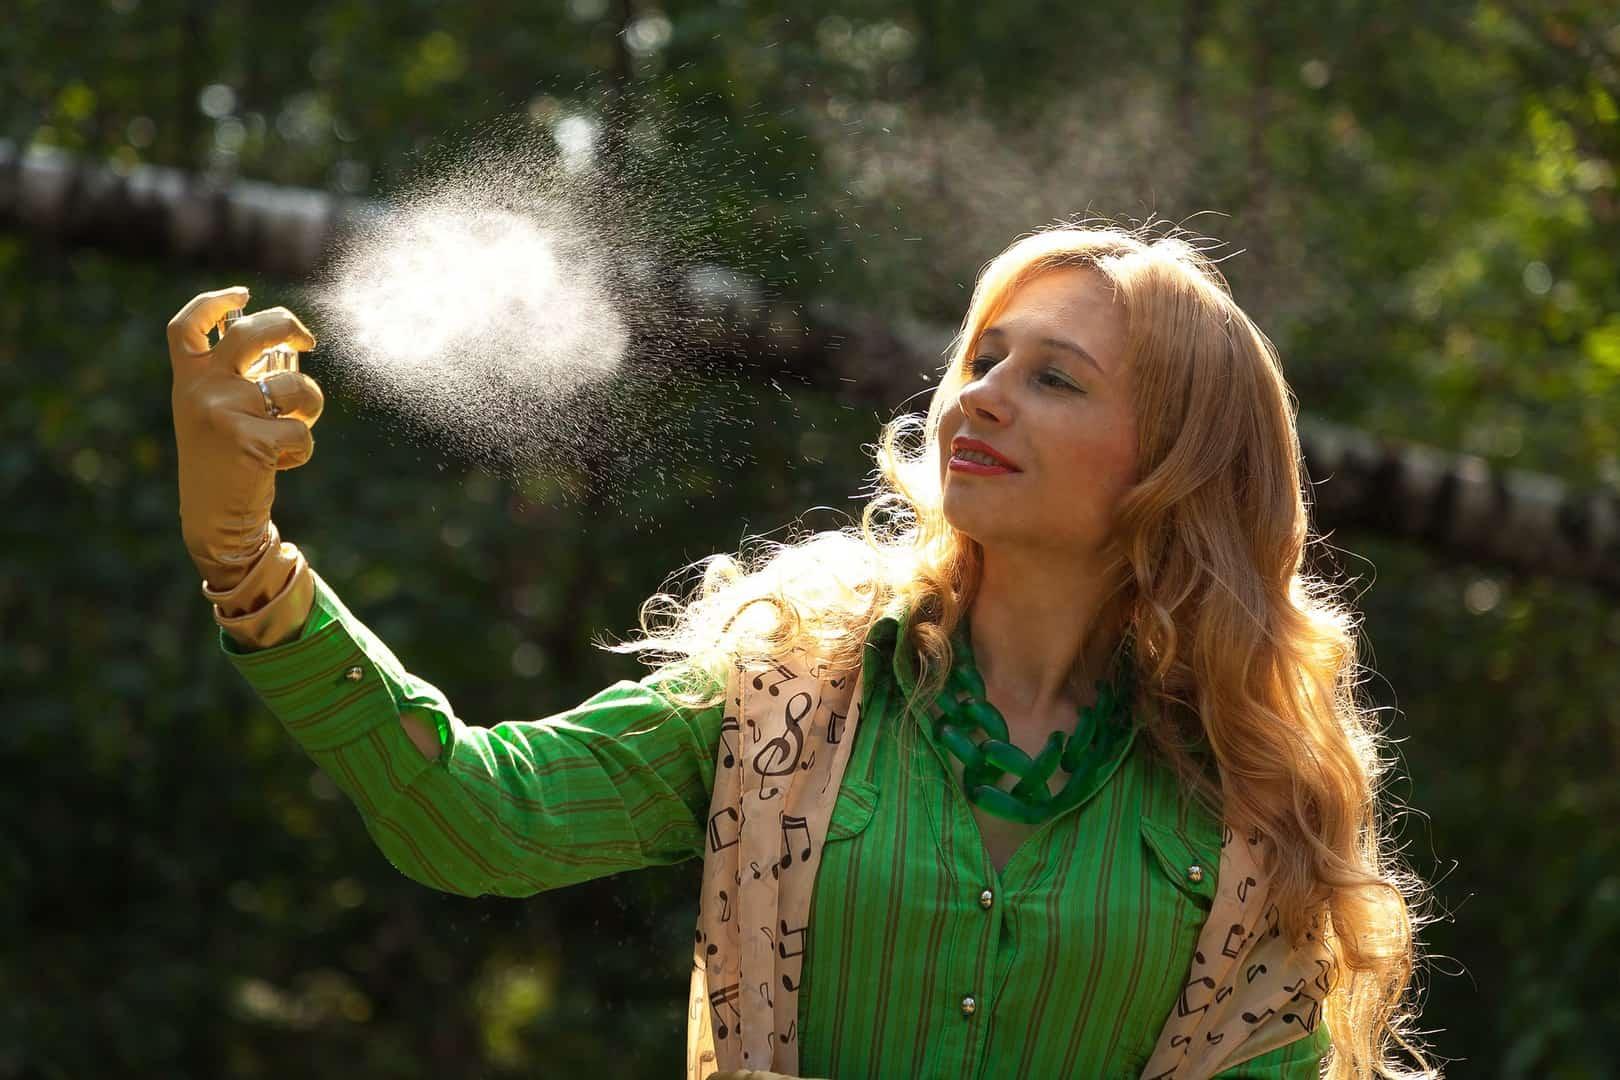 Personal spray